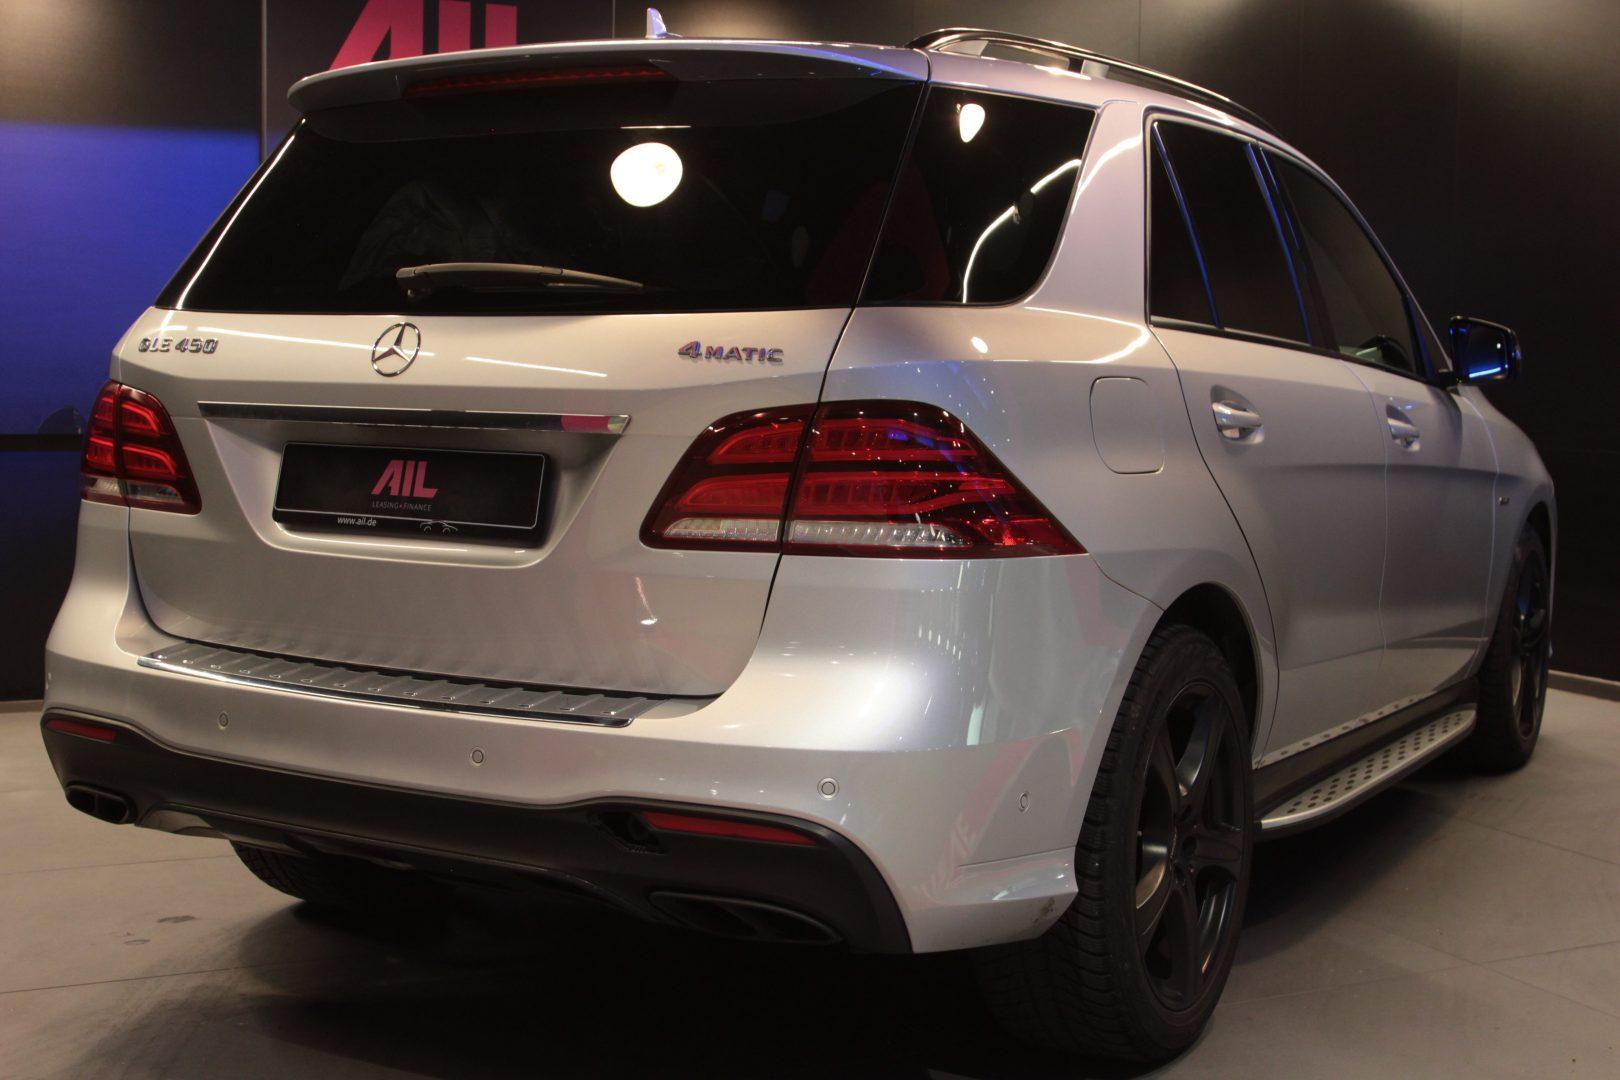 AIL Mercedes-Benz GLE 450 AMG 4Matic 2